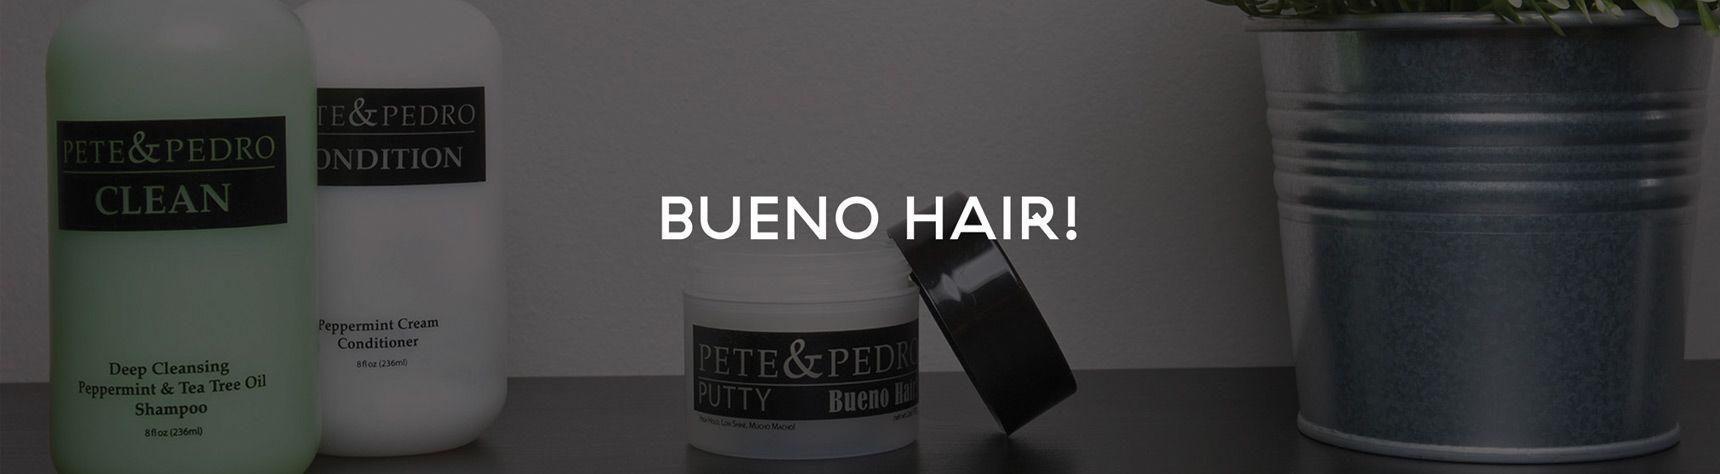 Pete & Pedro Bueno Hair